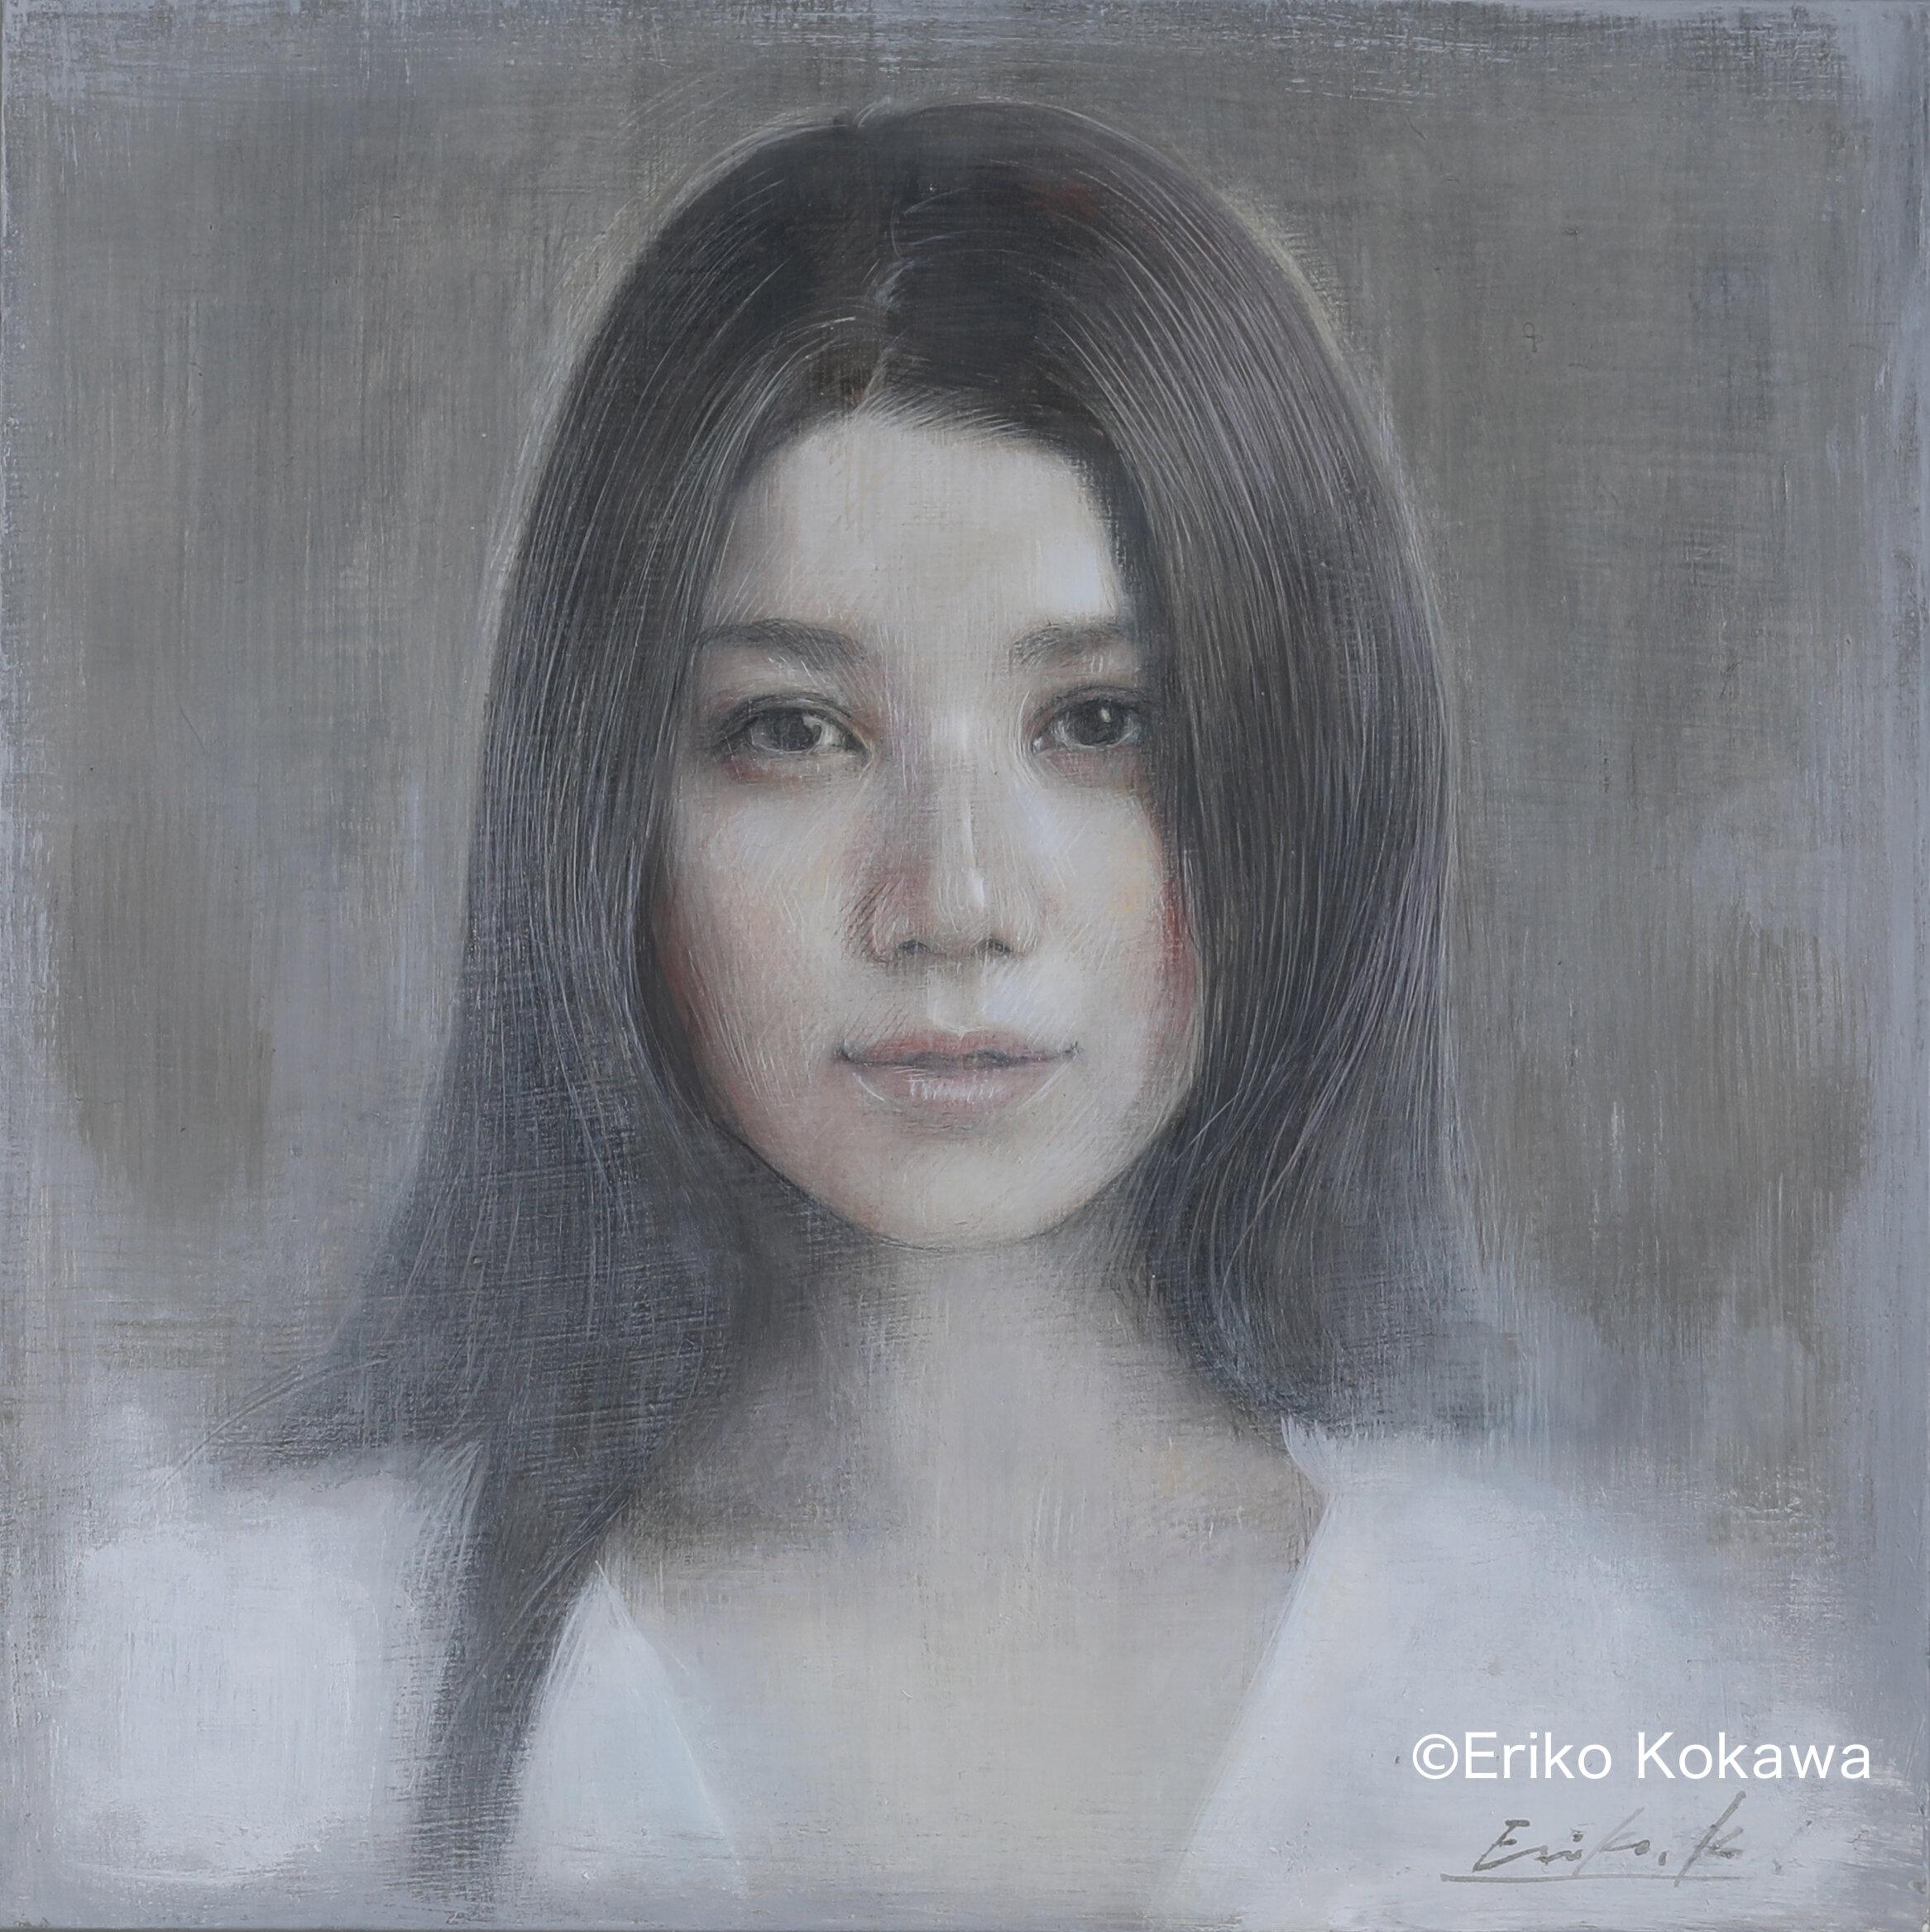 Eriko Kokawa_I'm your mirror.JPG